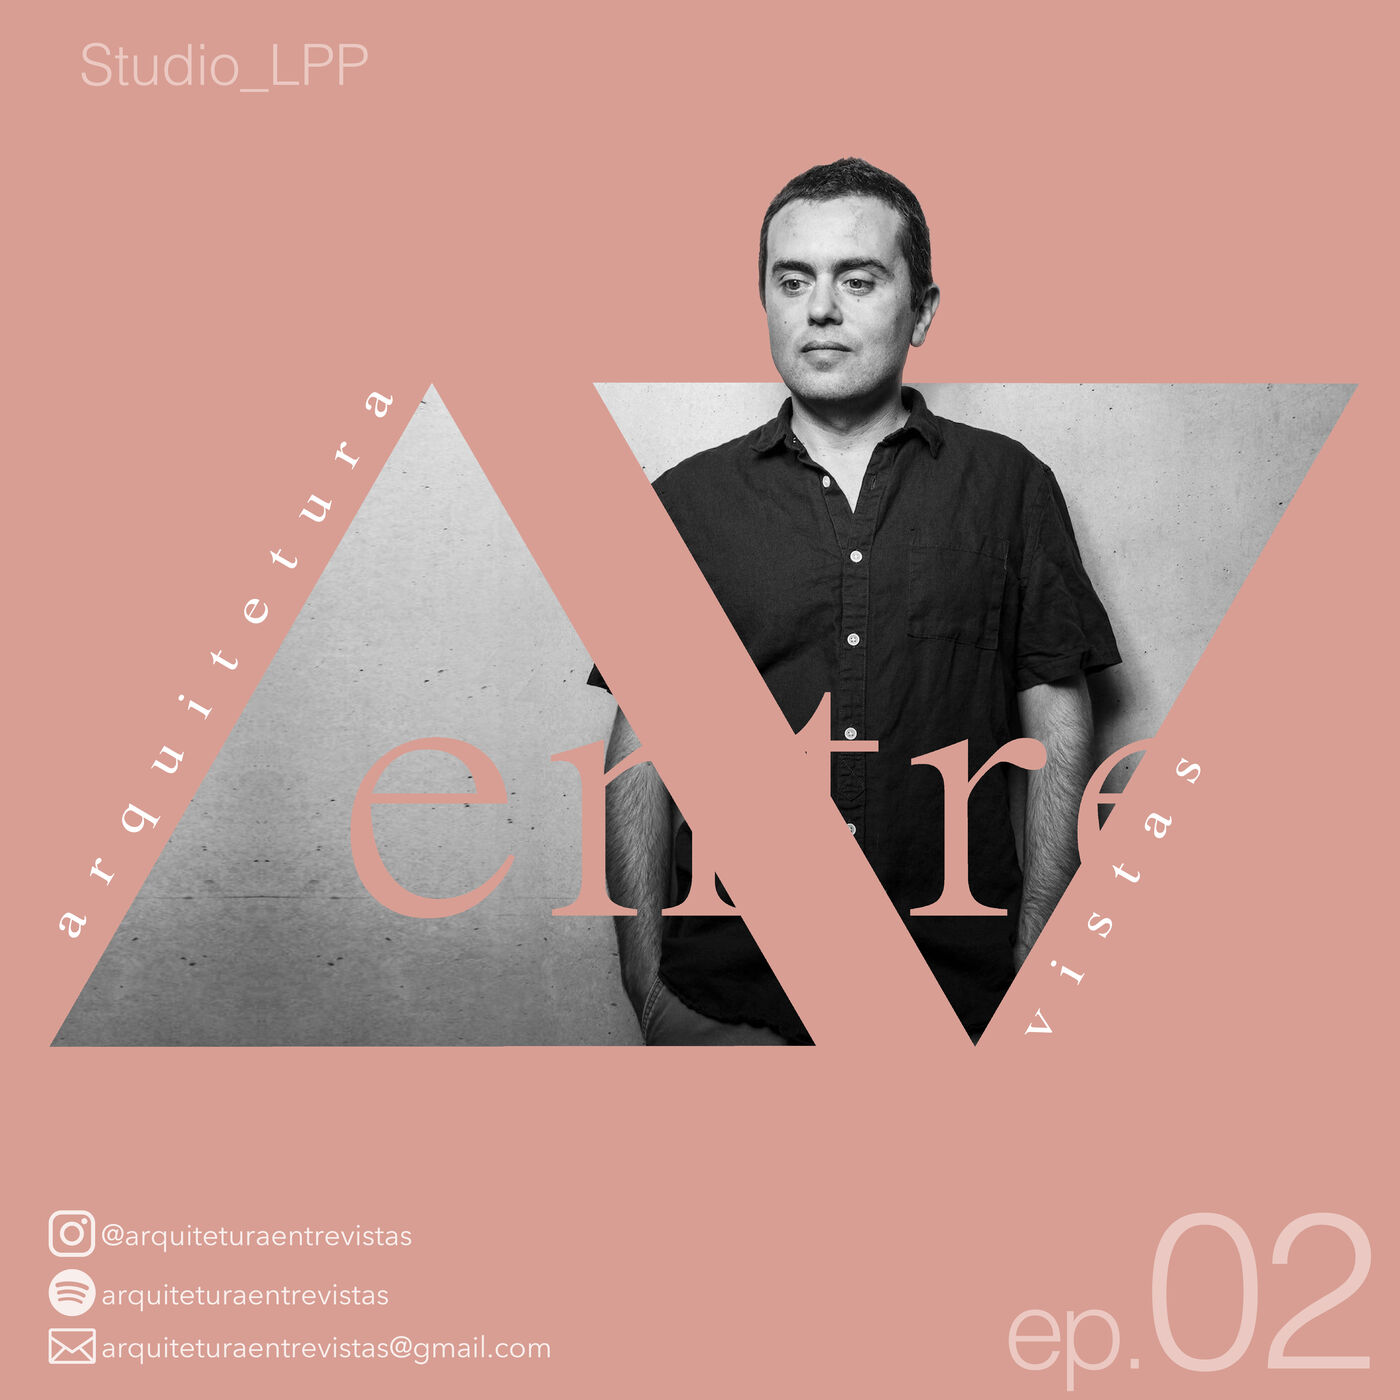 EP.2 StudioLPP, Arquitetura Entre Vistas